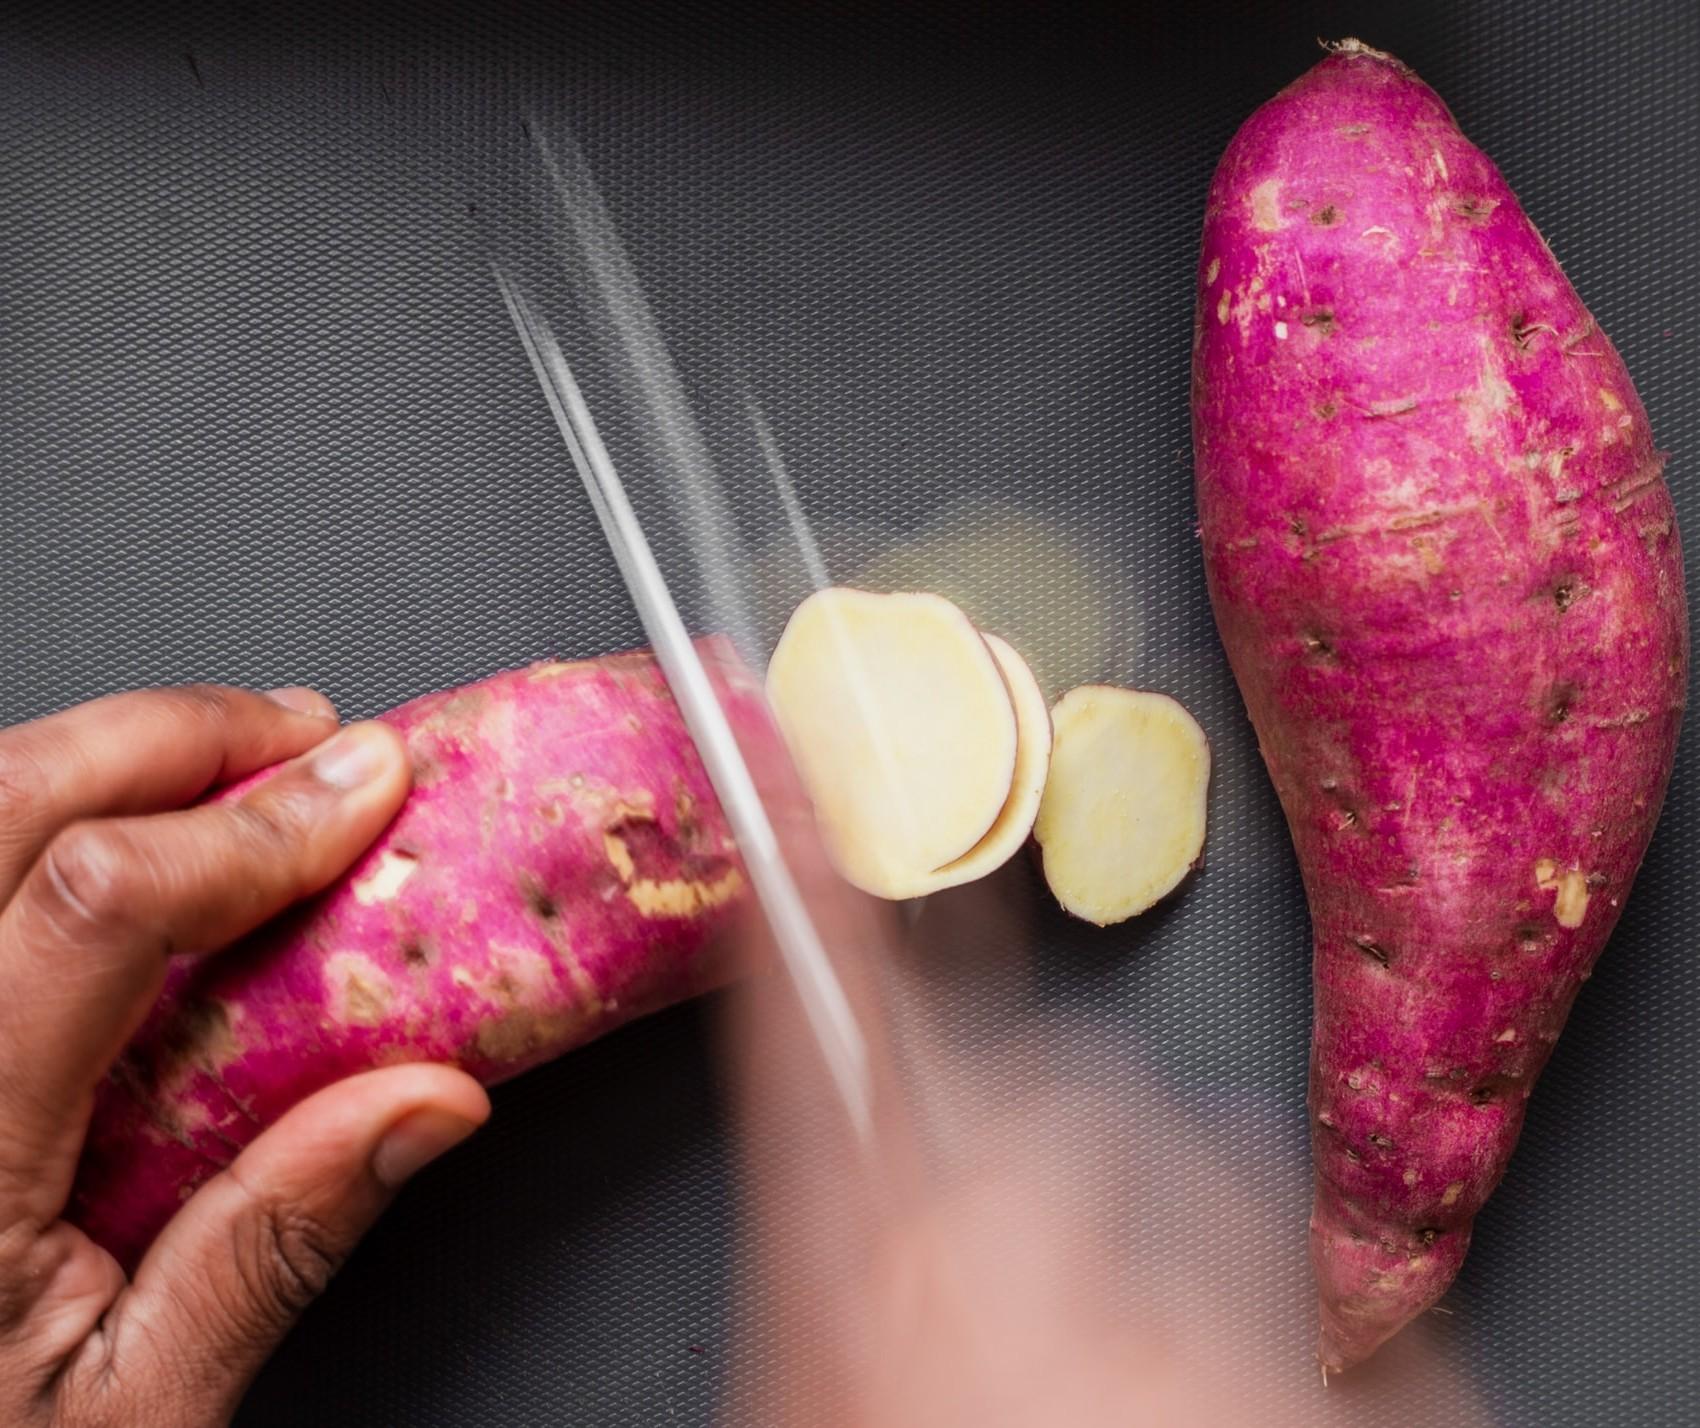 tipos de batata